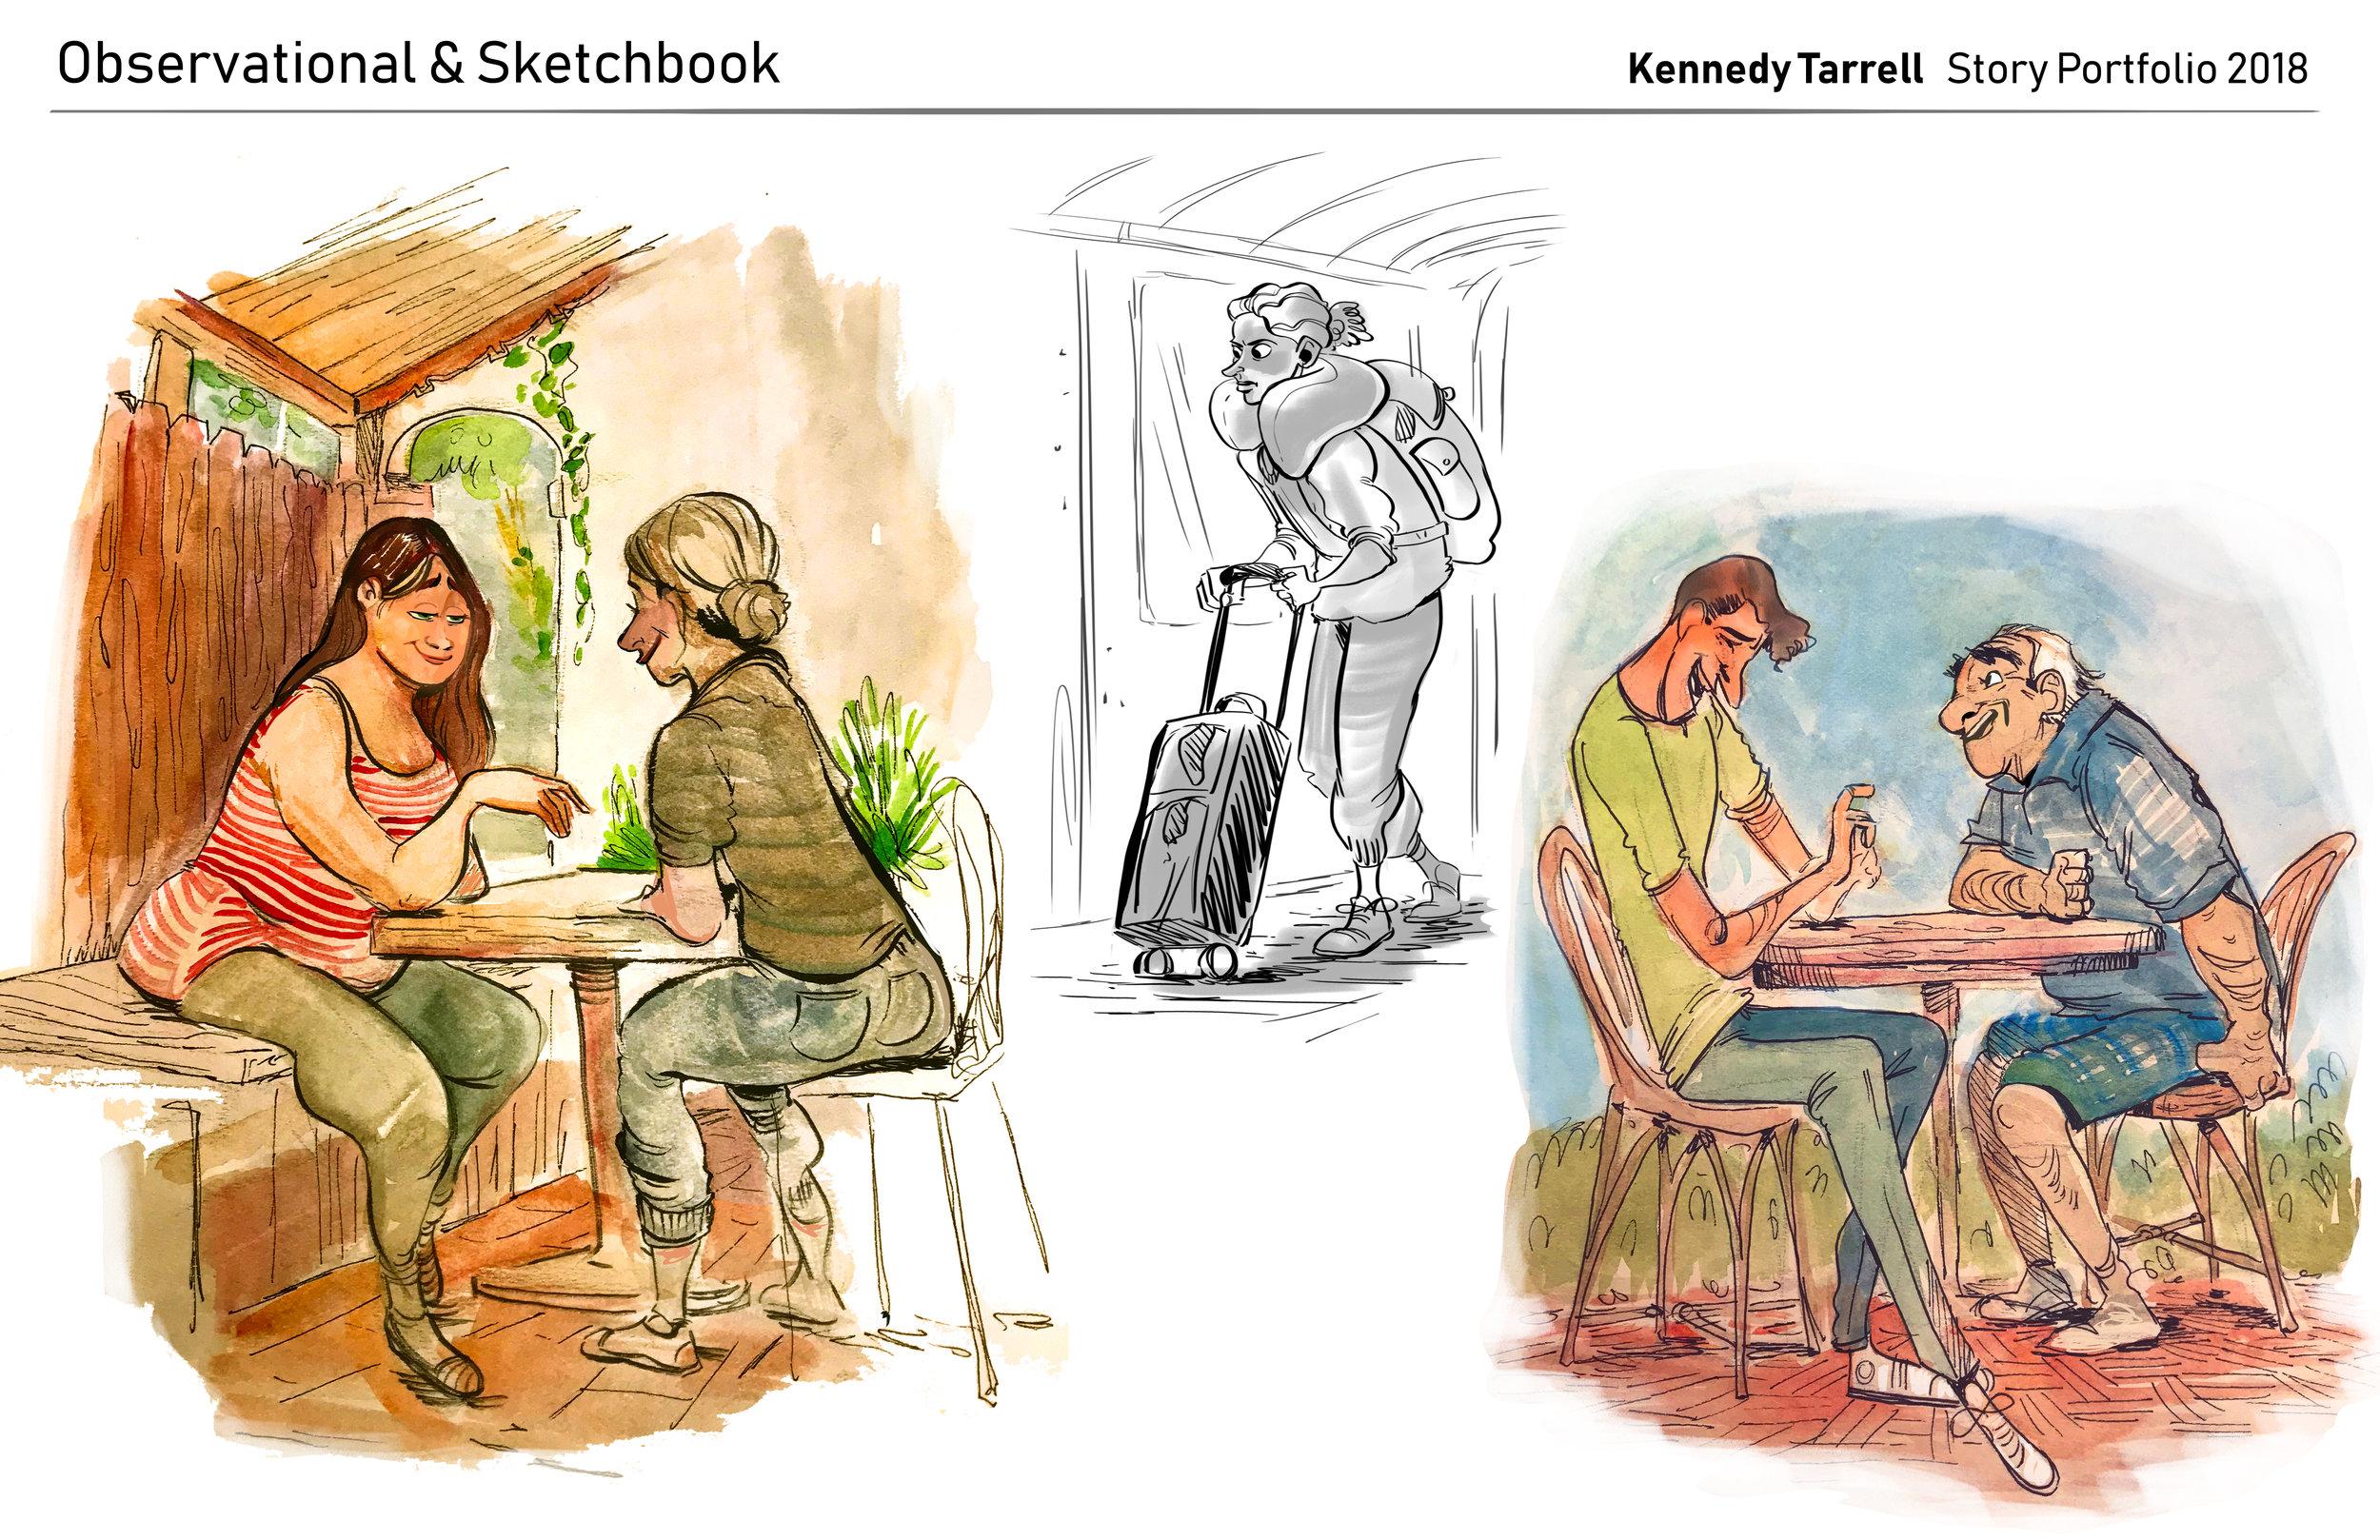 04_KennedyTarrell_Observational1.jpg